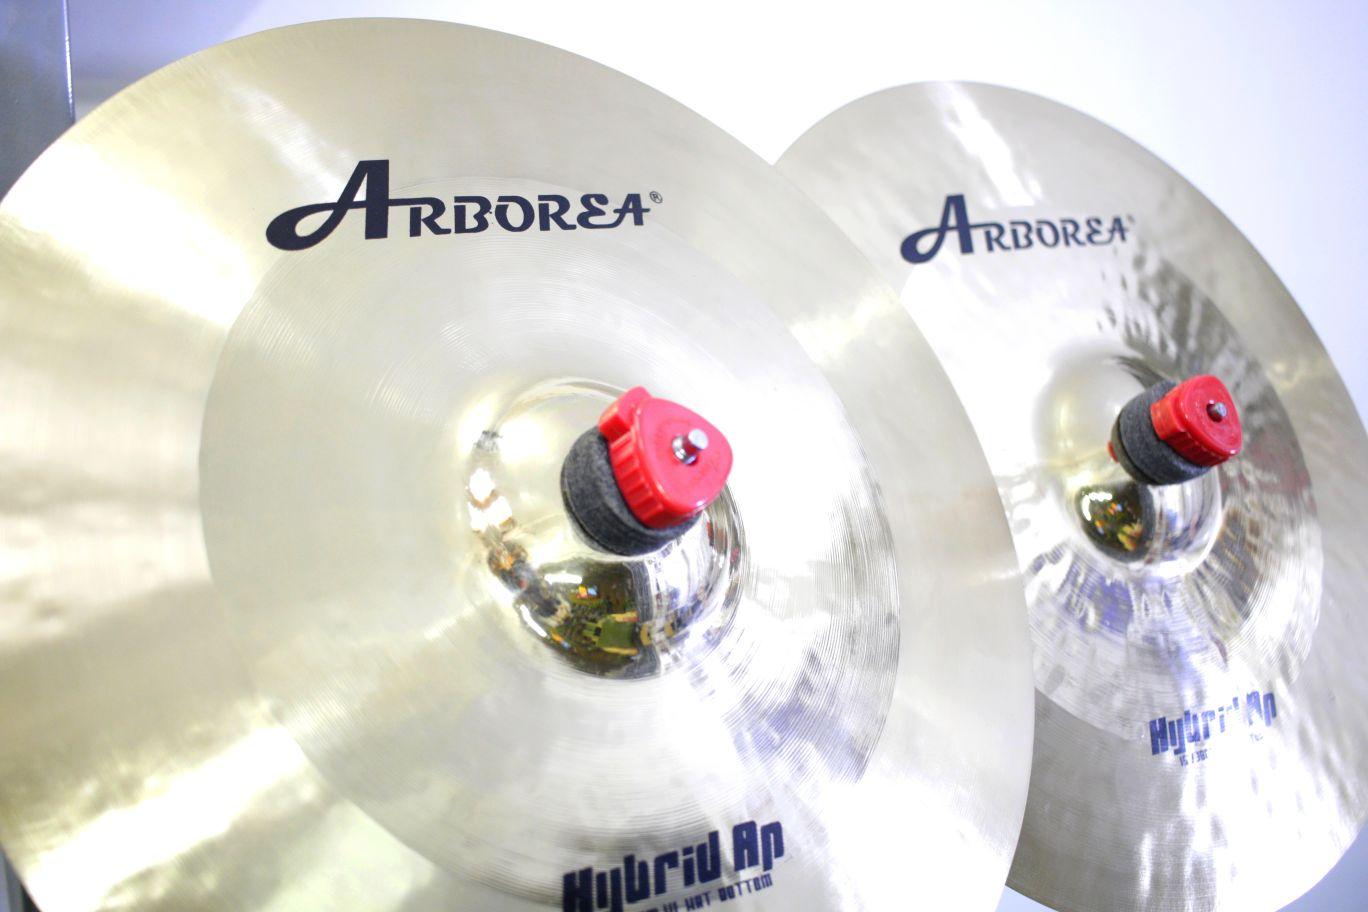 HI HAT 15 HYBRID AP ARBOREA